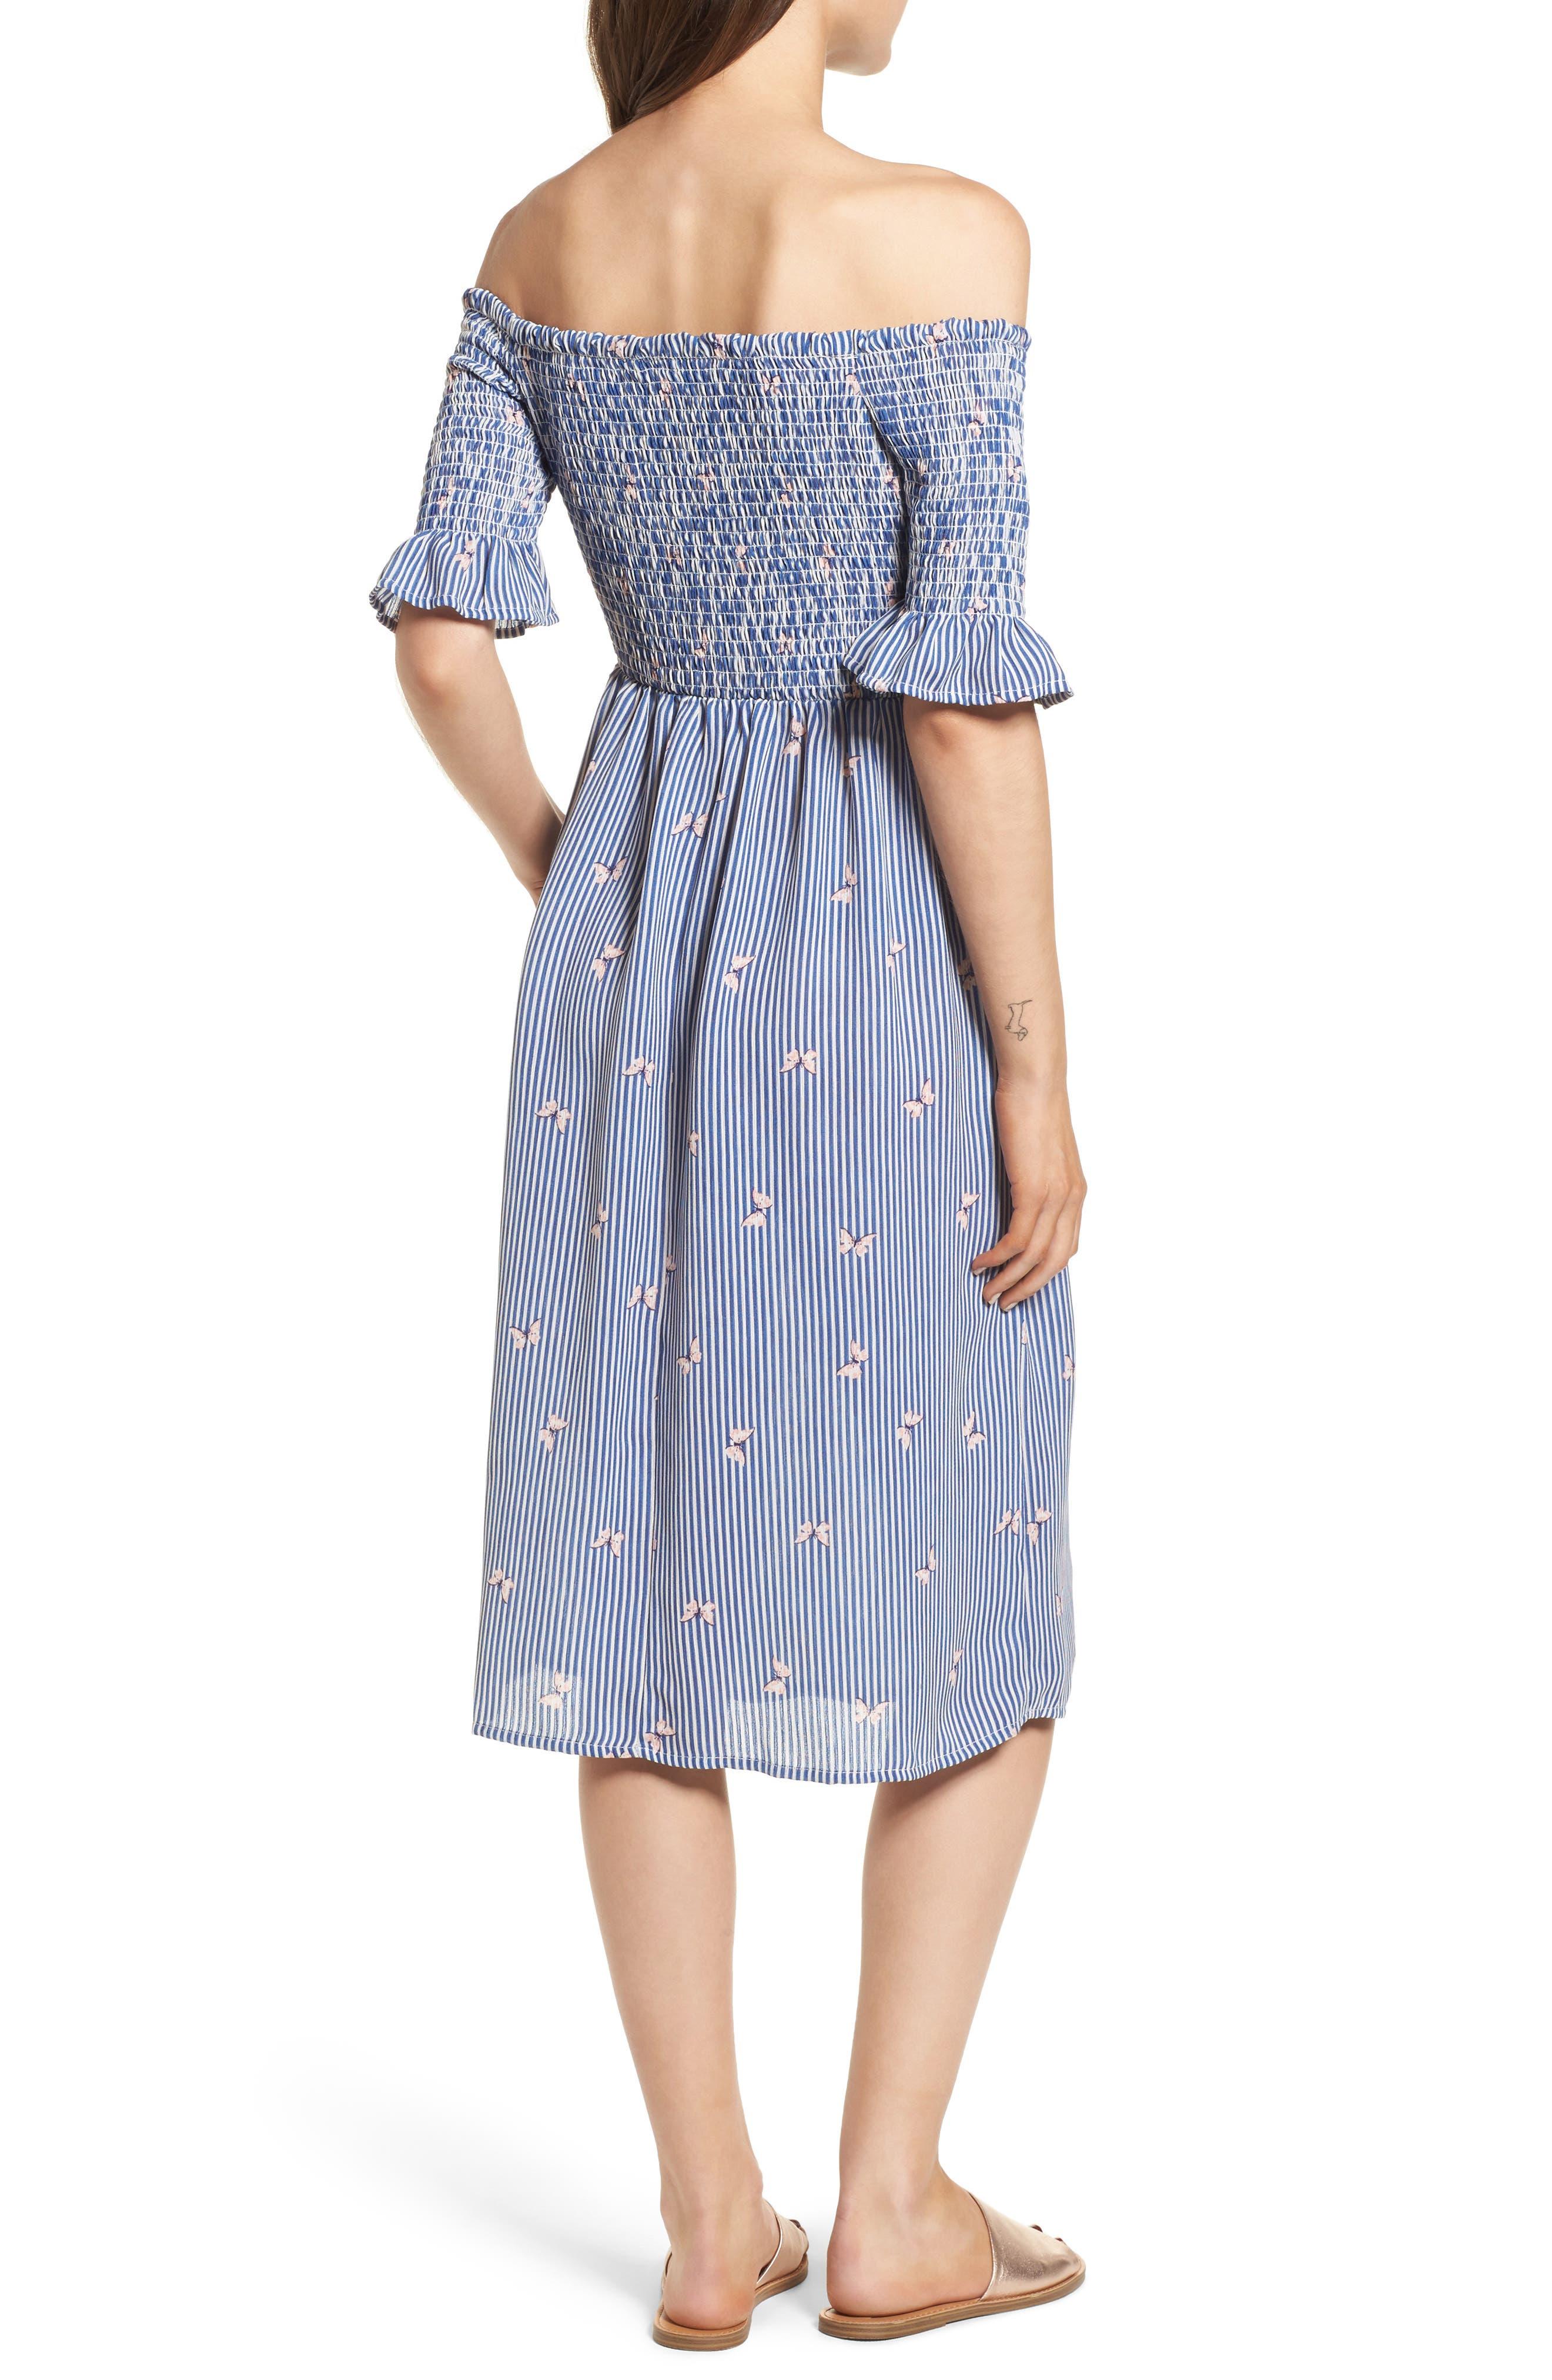 Smocked Midi Dress,                             Alternate thumbnail 2, color,                             Off White/ Blue